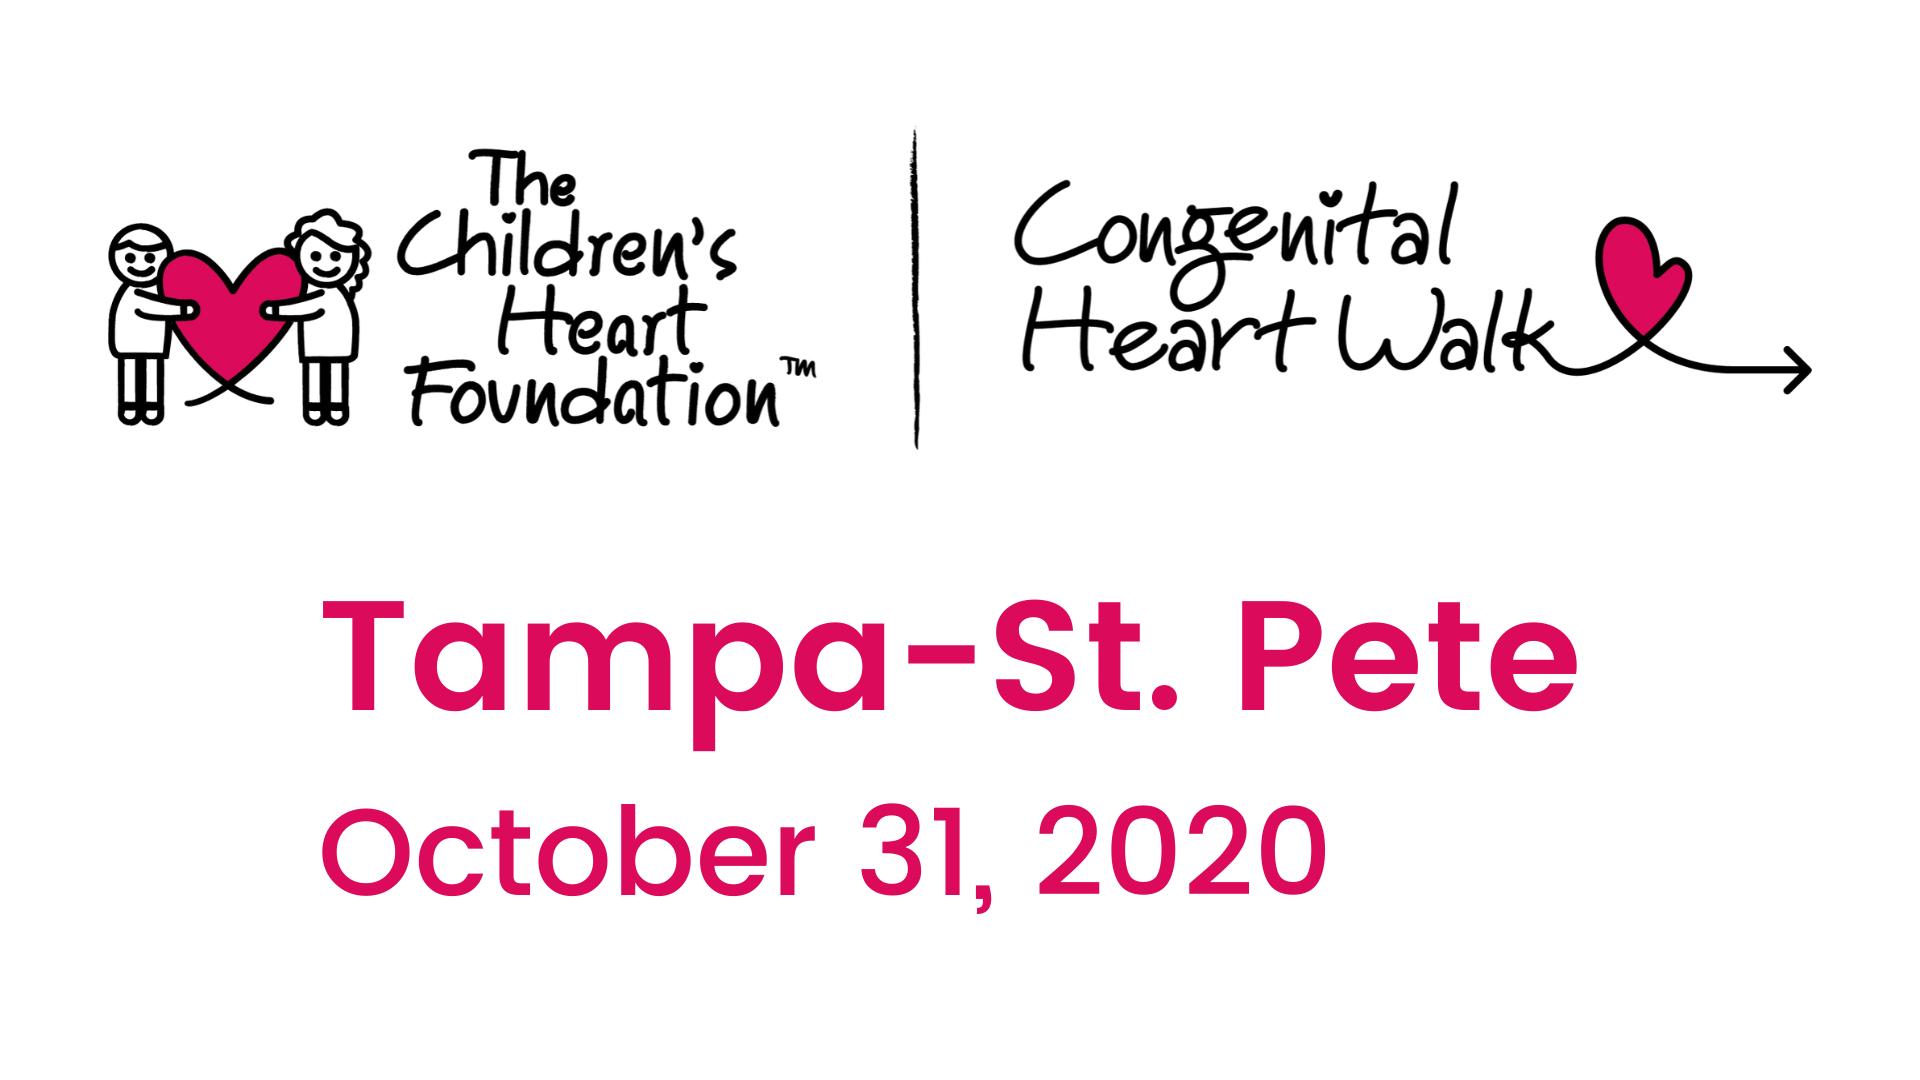 Tampa-St. Pete Congenital Heart Walk (Florida)